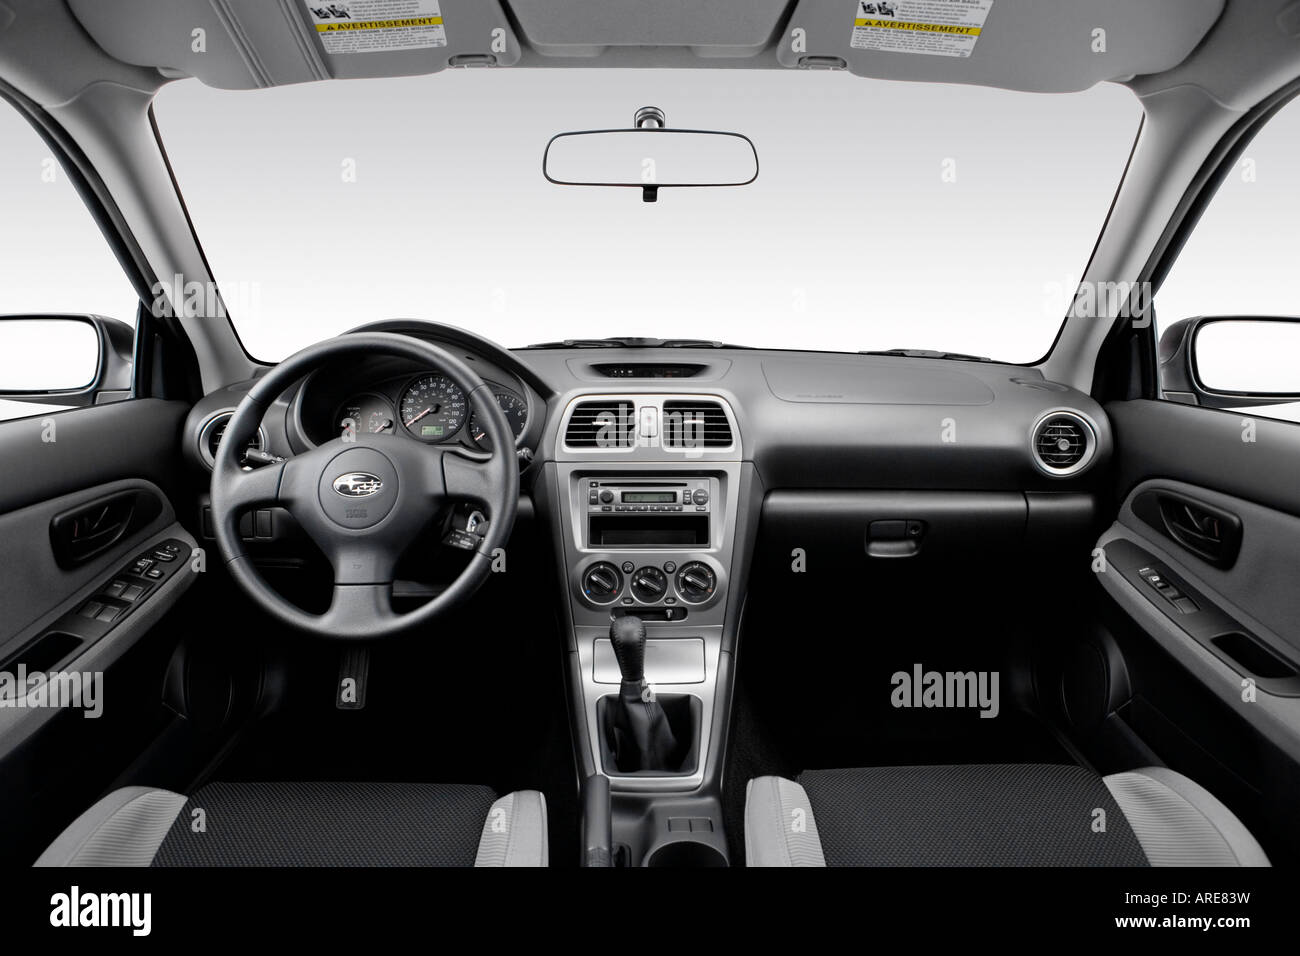 2006 subaru impreza 2.5i in gray - dashboard, center console, gear